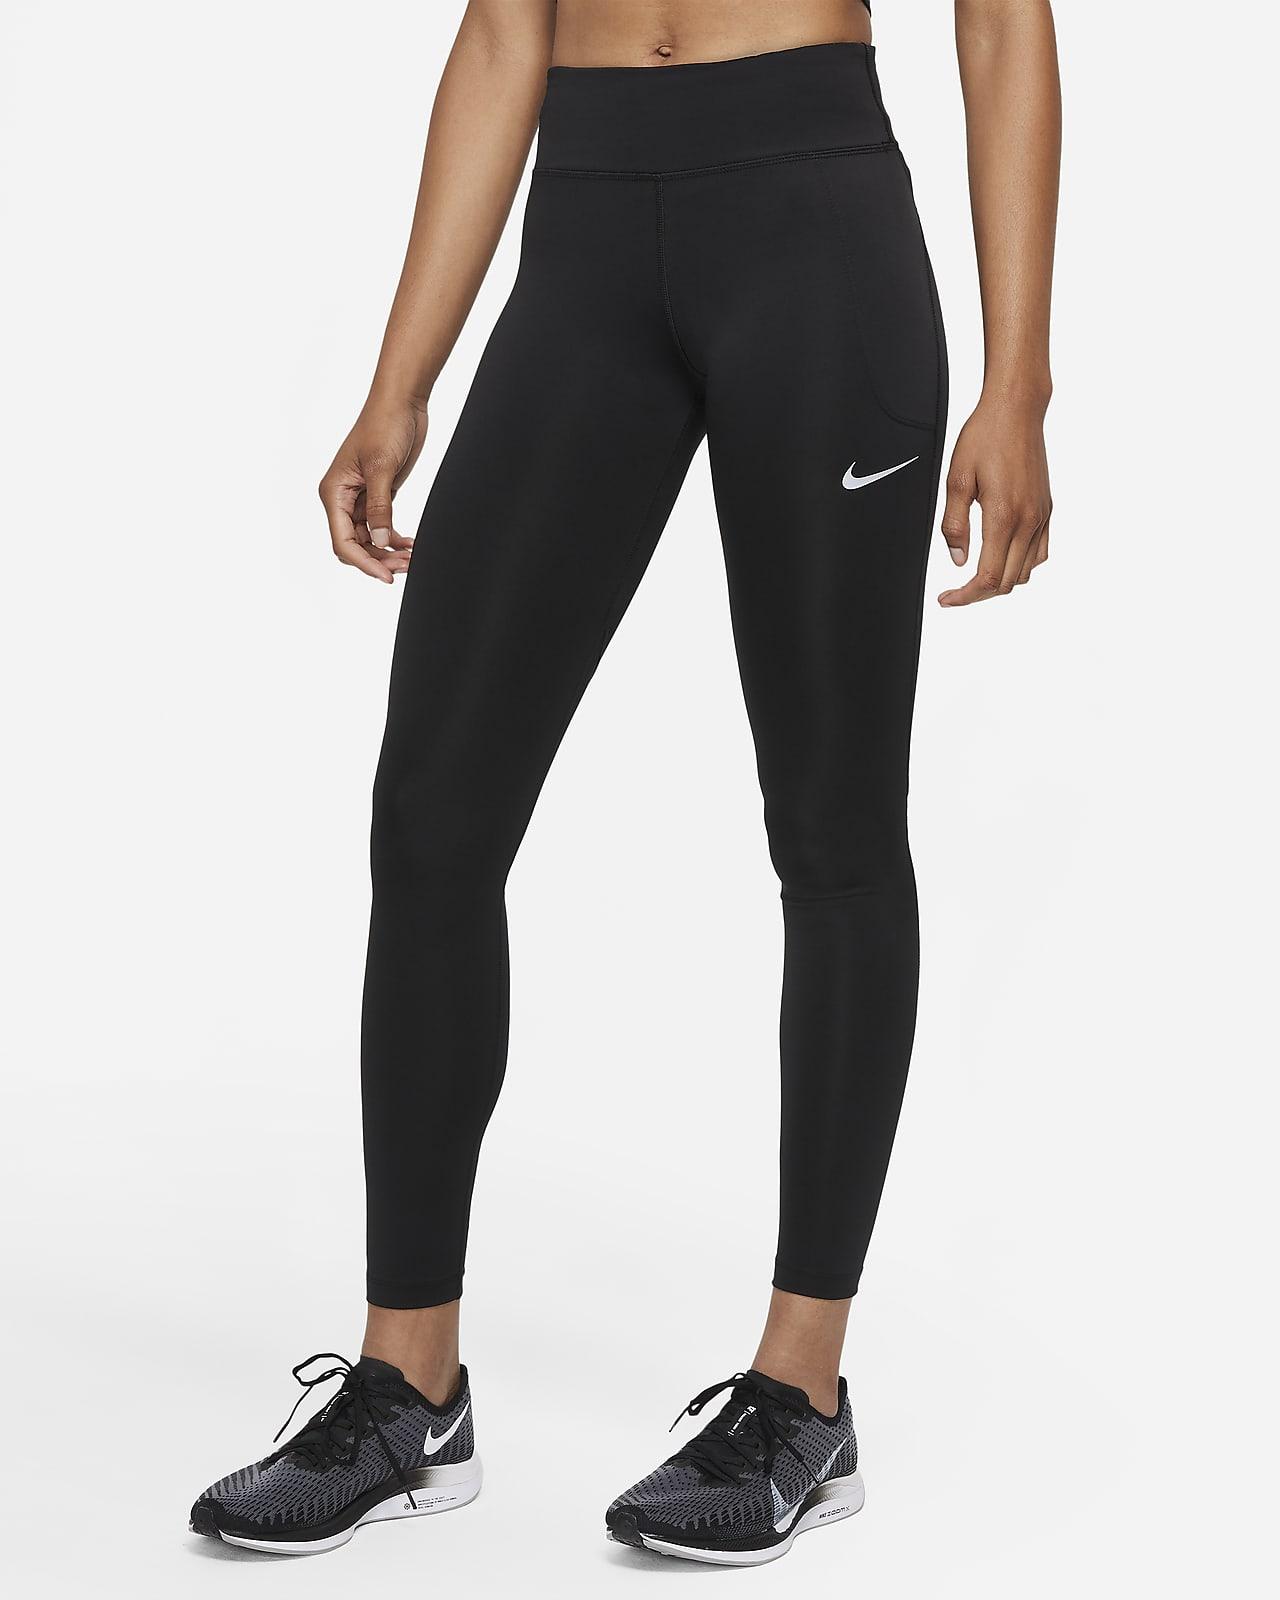 Leggings de running de tiro medio para mujer Nike Fast